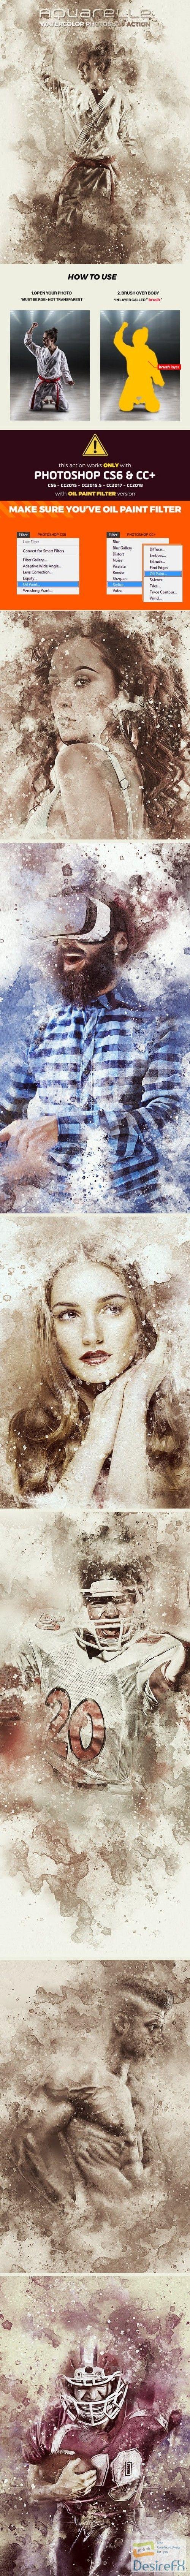 Watercolor Photoshop Psd Template Psd Templates Photoshop